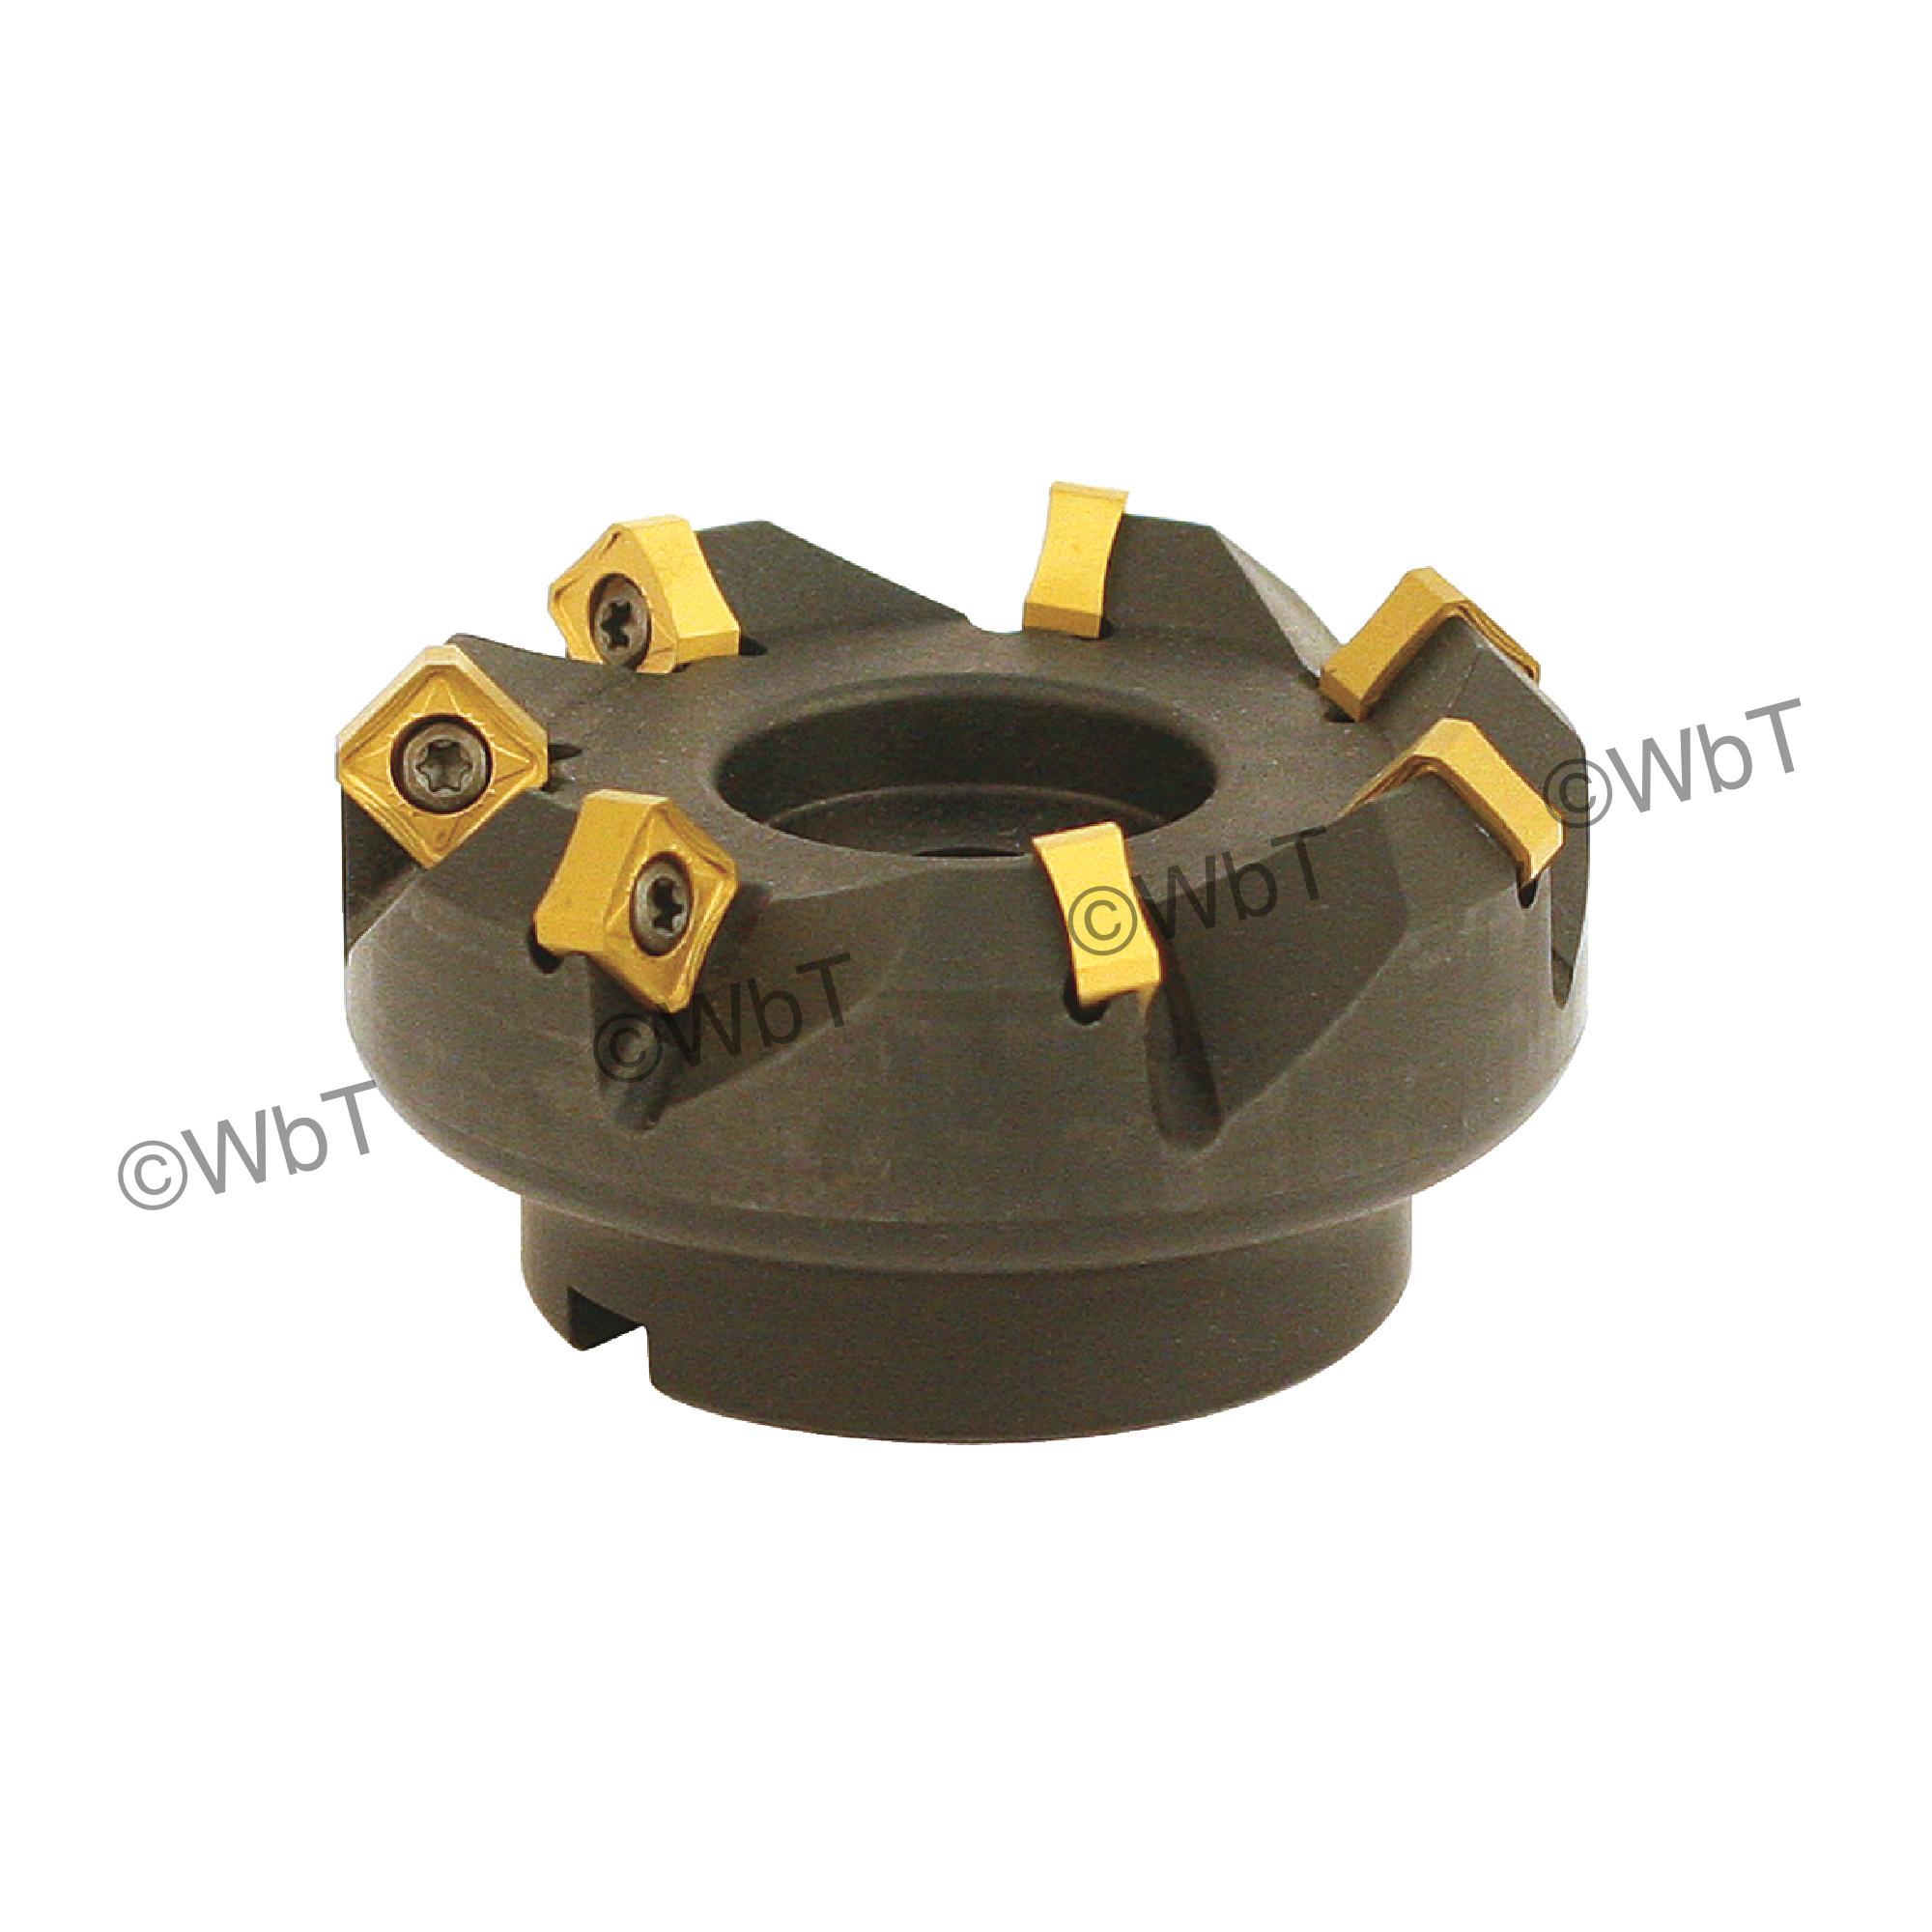 "AKUMA - 3.000"" - 45° Face Mill Set / Includes: (1) SNAC.12.300R-7 (3.0"" ø) & (10) SNMX1205ANN-M1 CM30P Coate"